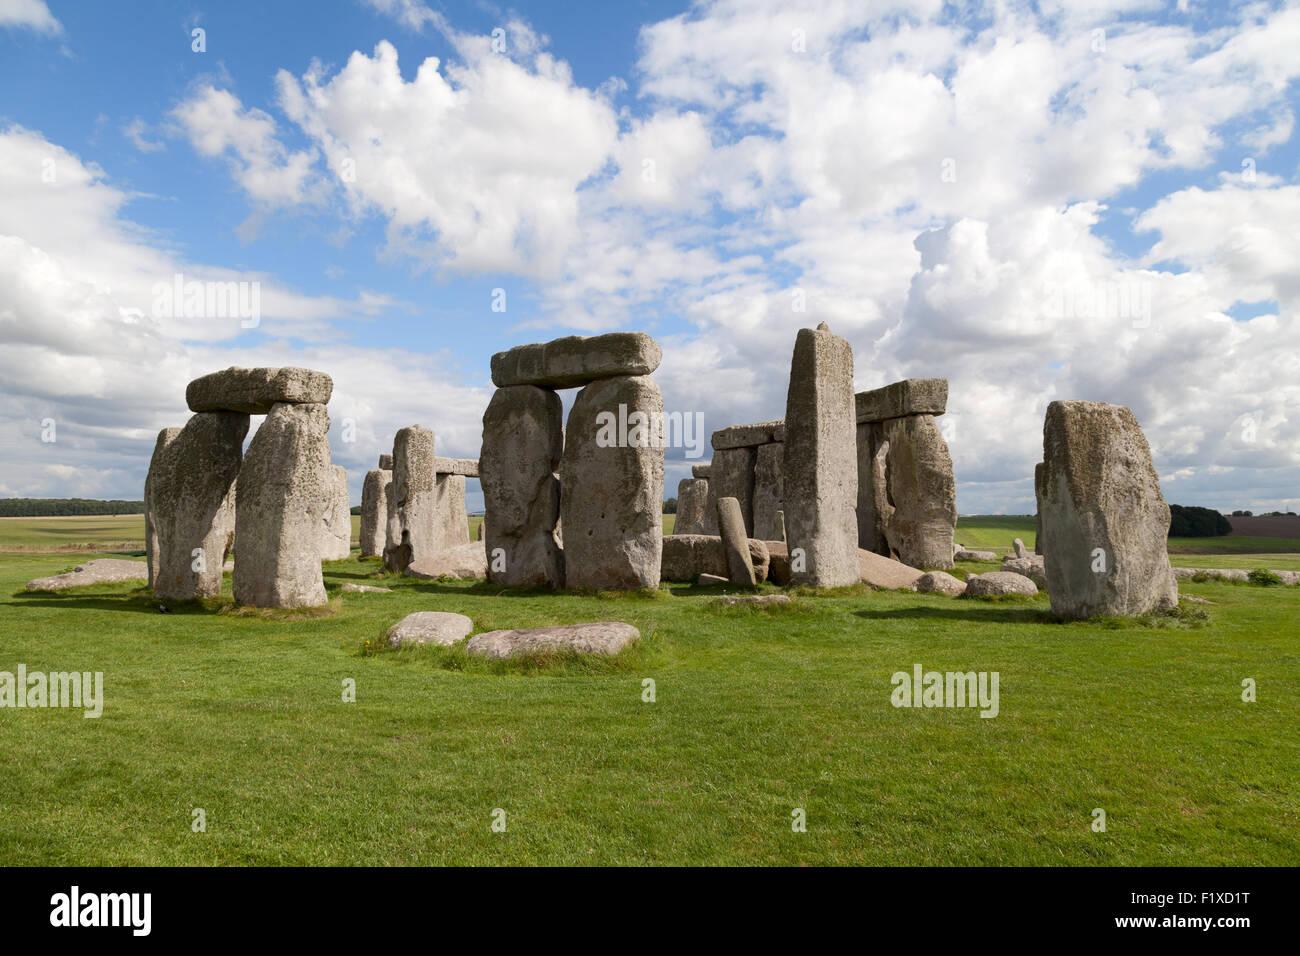 Stonehenge prehistoric neolithic monument and Unesco World Heritage site, Wiltshire England UK Stock Photo